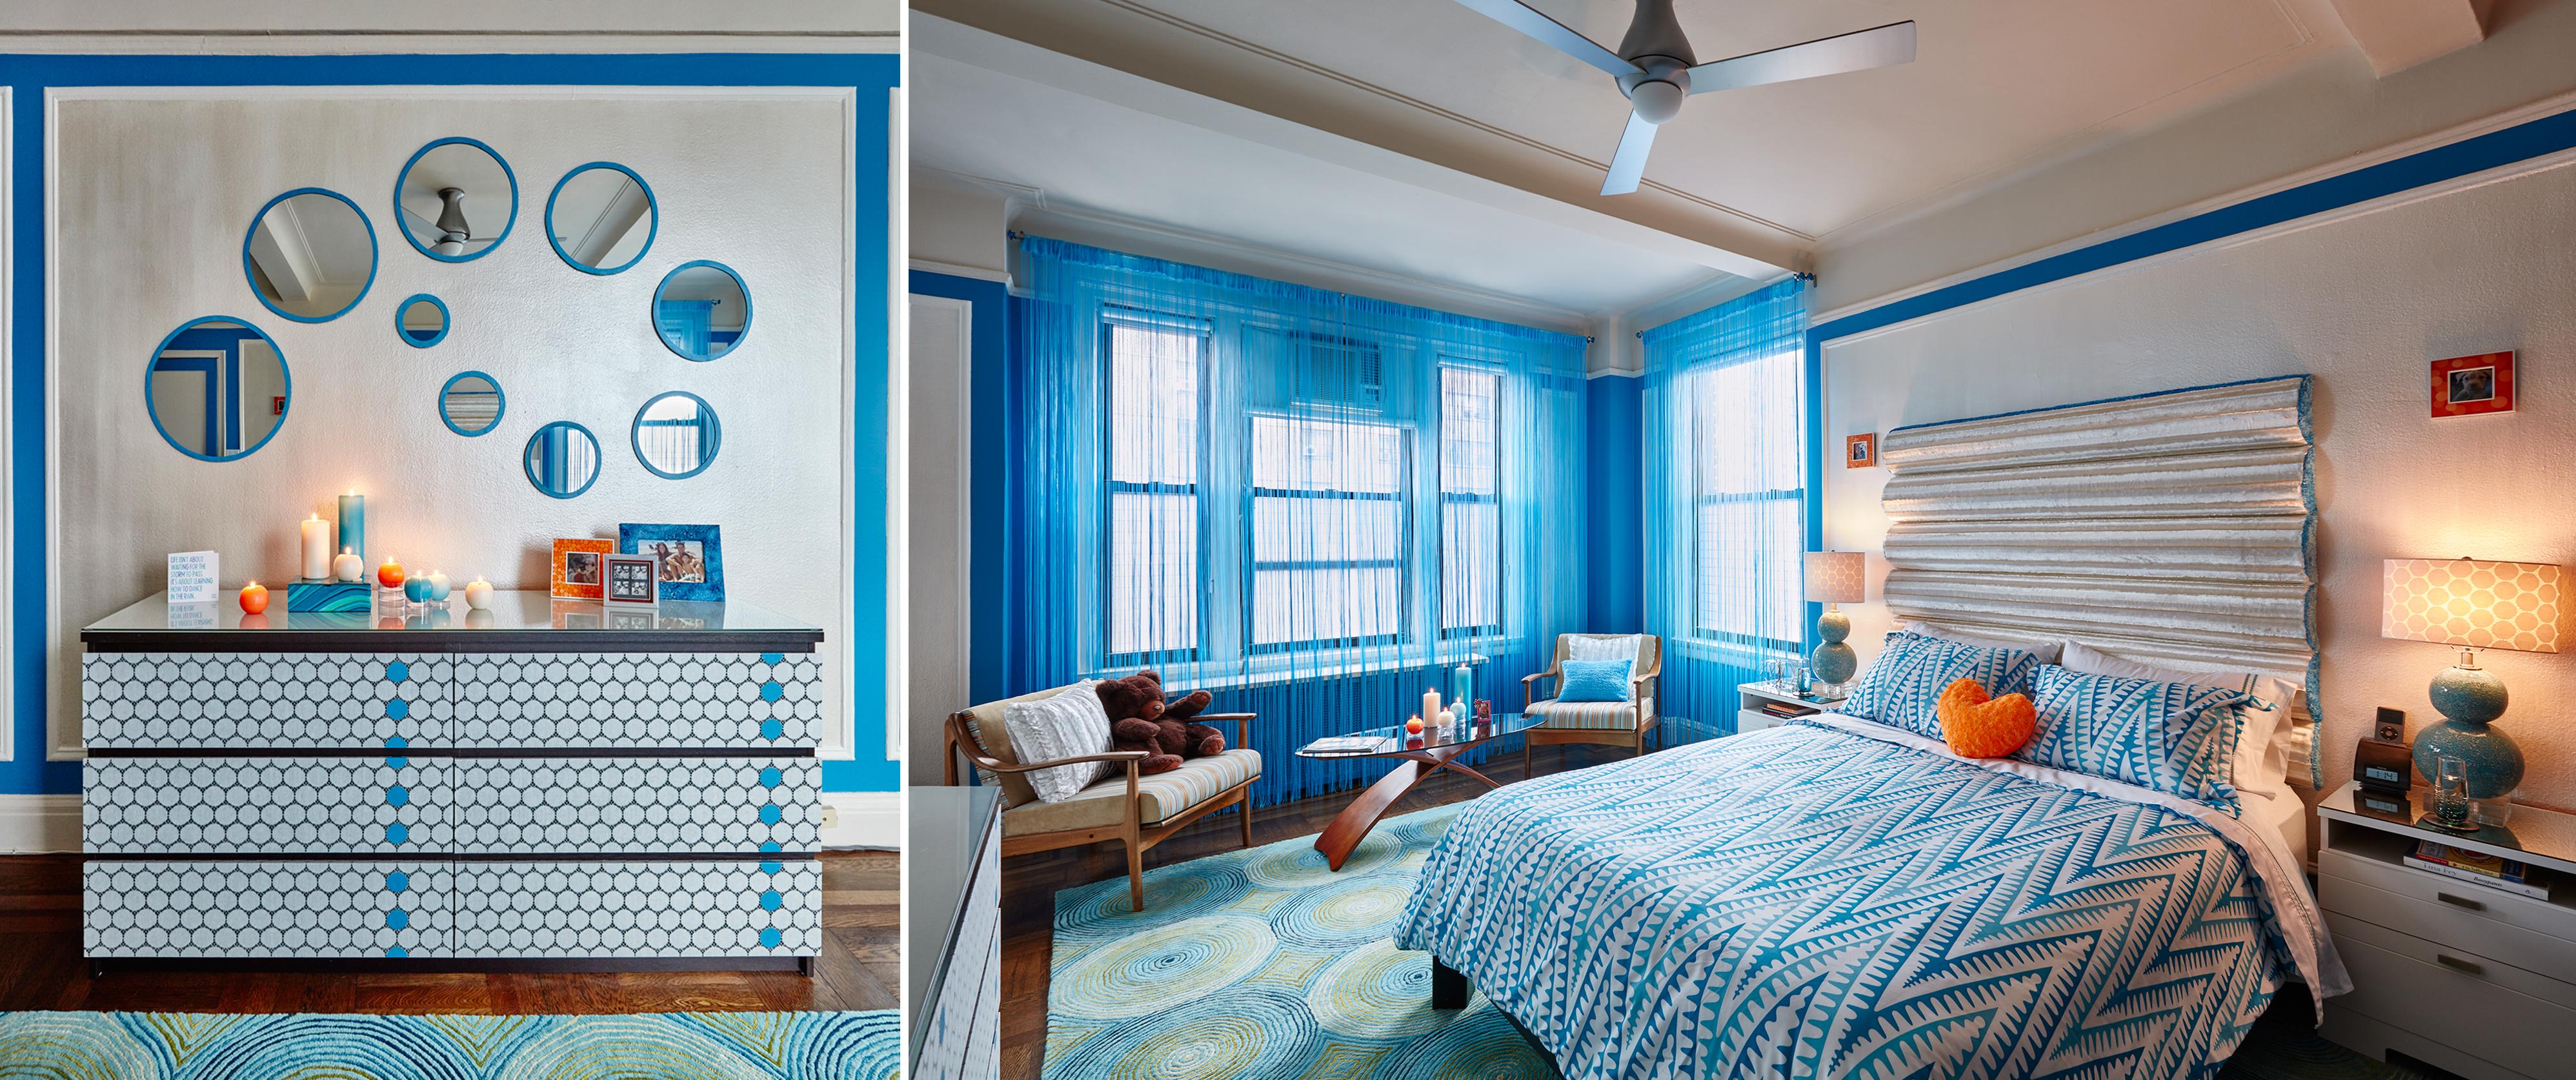 InsideWright_UWS_bedroom_split2